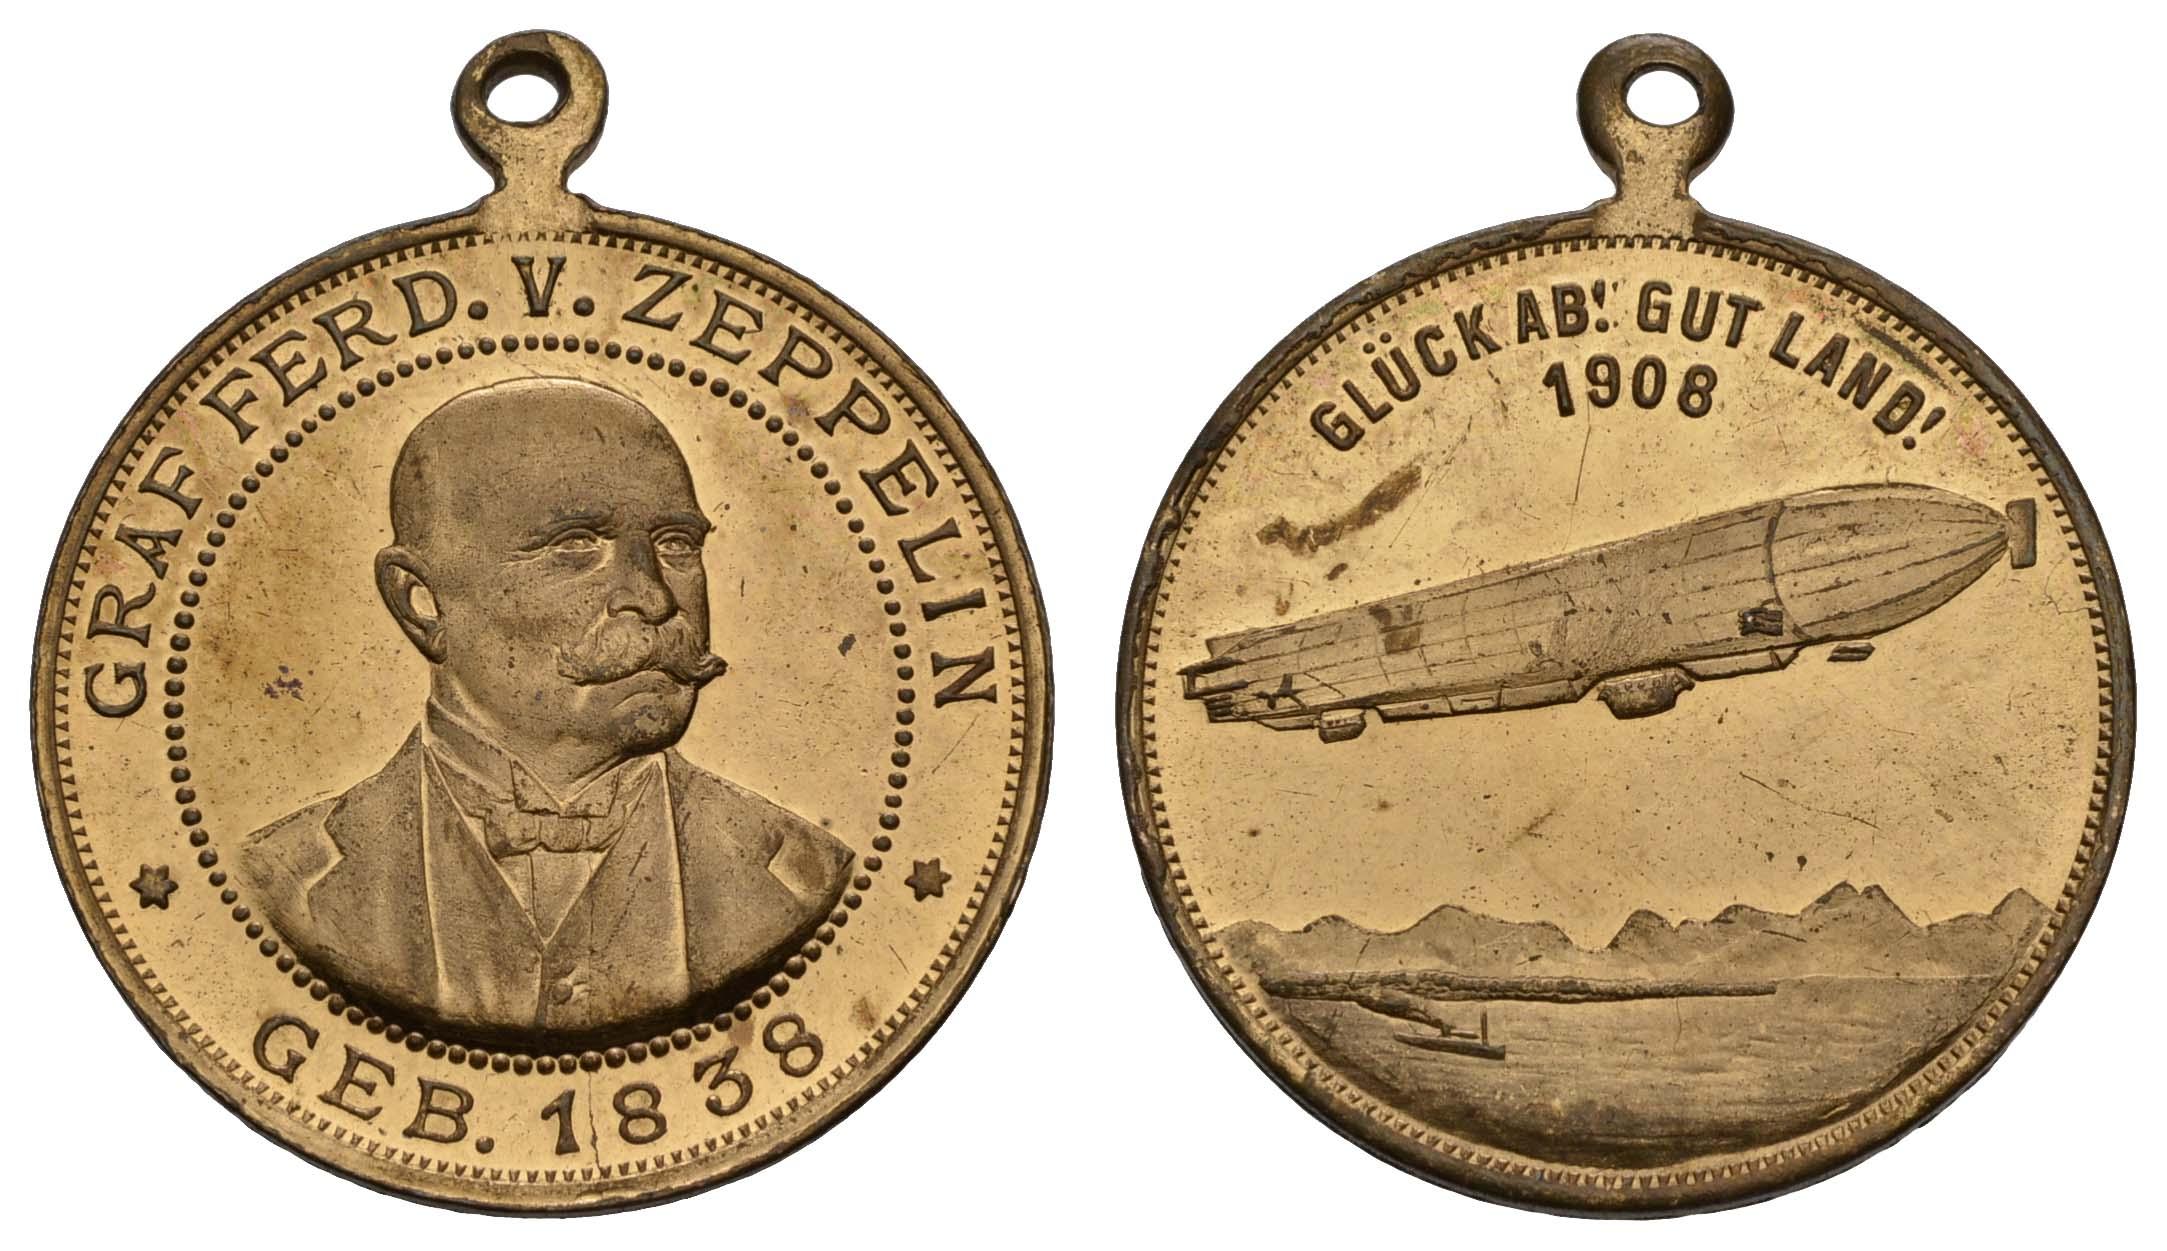 Lot 2332 - medaillen Sonstige Medaillen - Zeppelin -  Auktionshaus Ulrich Felzmann GmbH & Co. KG Coins single lots